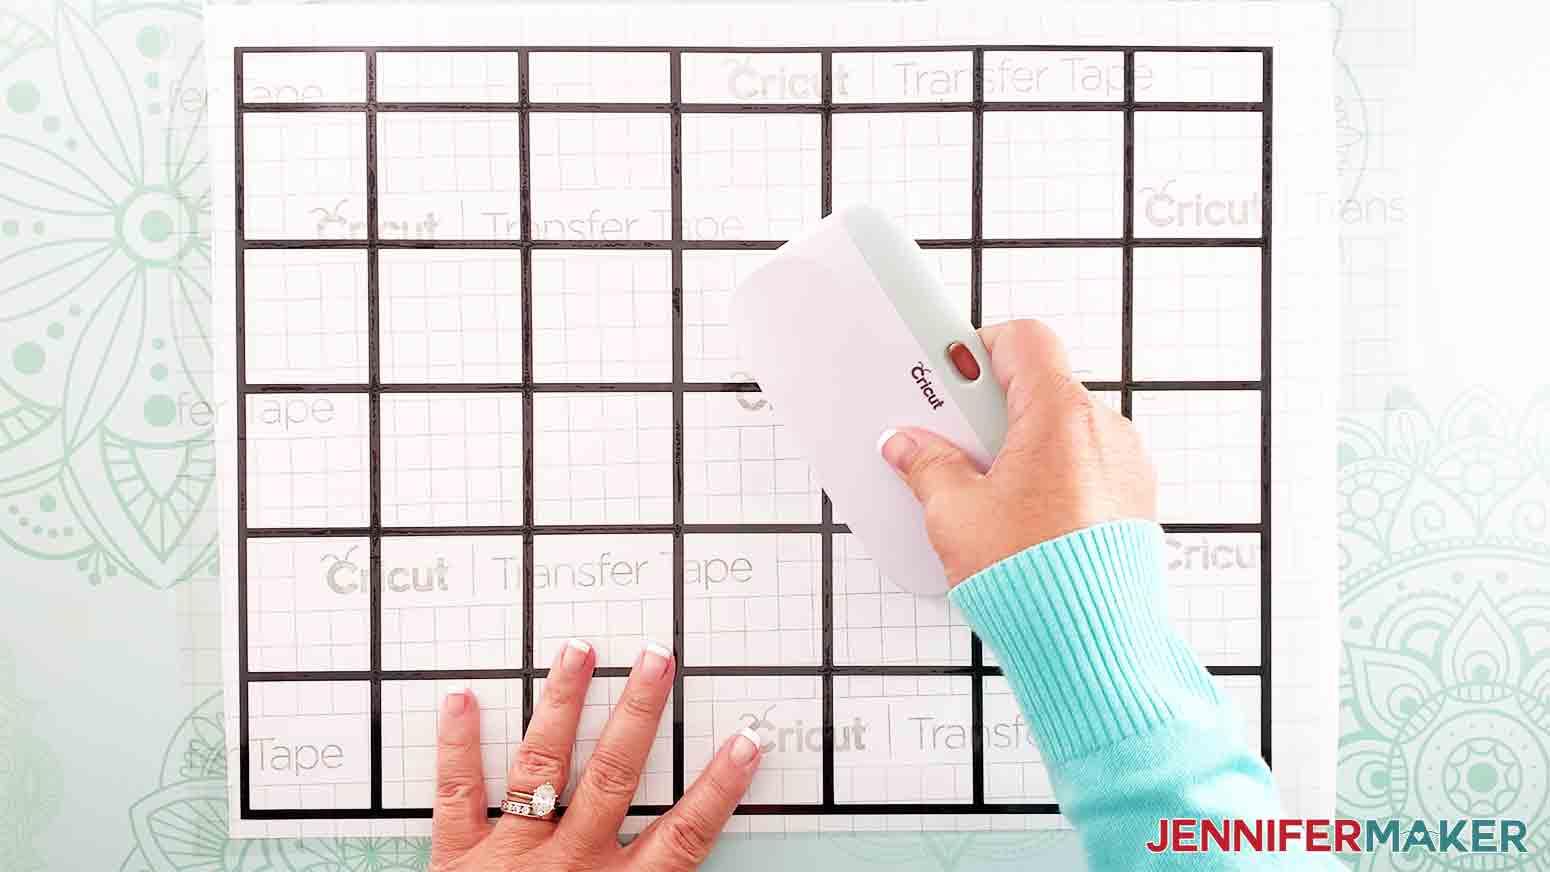 DIY-Whiteboard-Calendar-JenniferMaker-smooth-transfer-tape-with-scraper